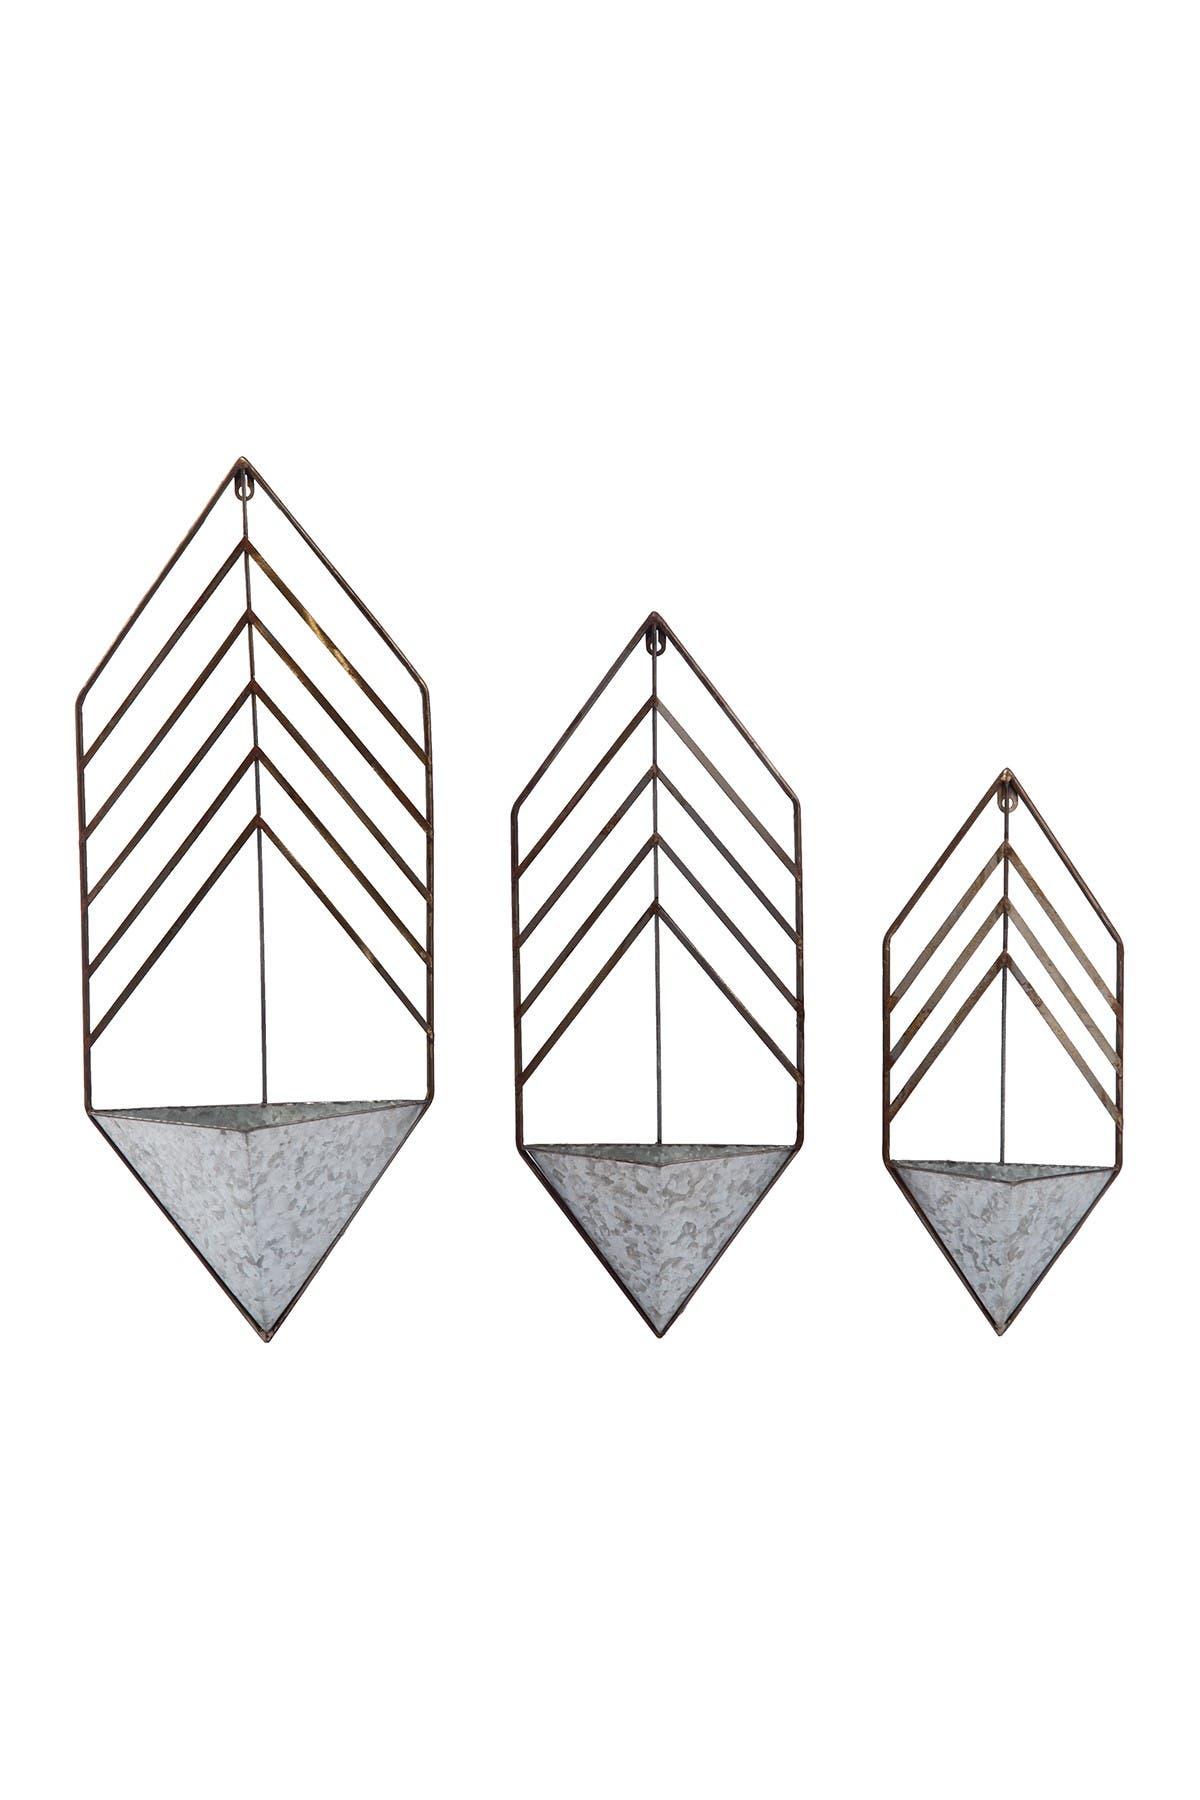 Image of Transpac Metal Galvanized Nested Planter - Set of 3